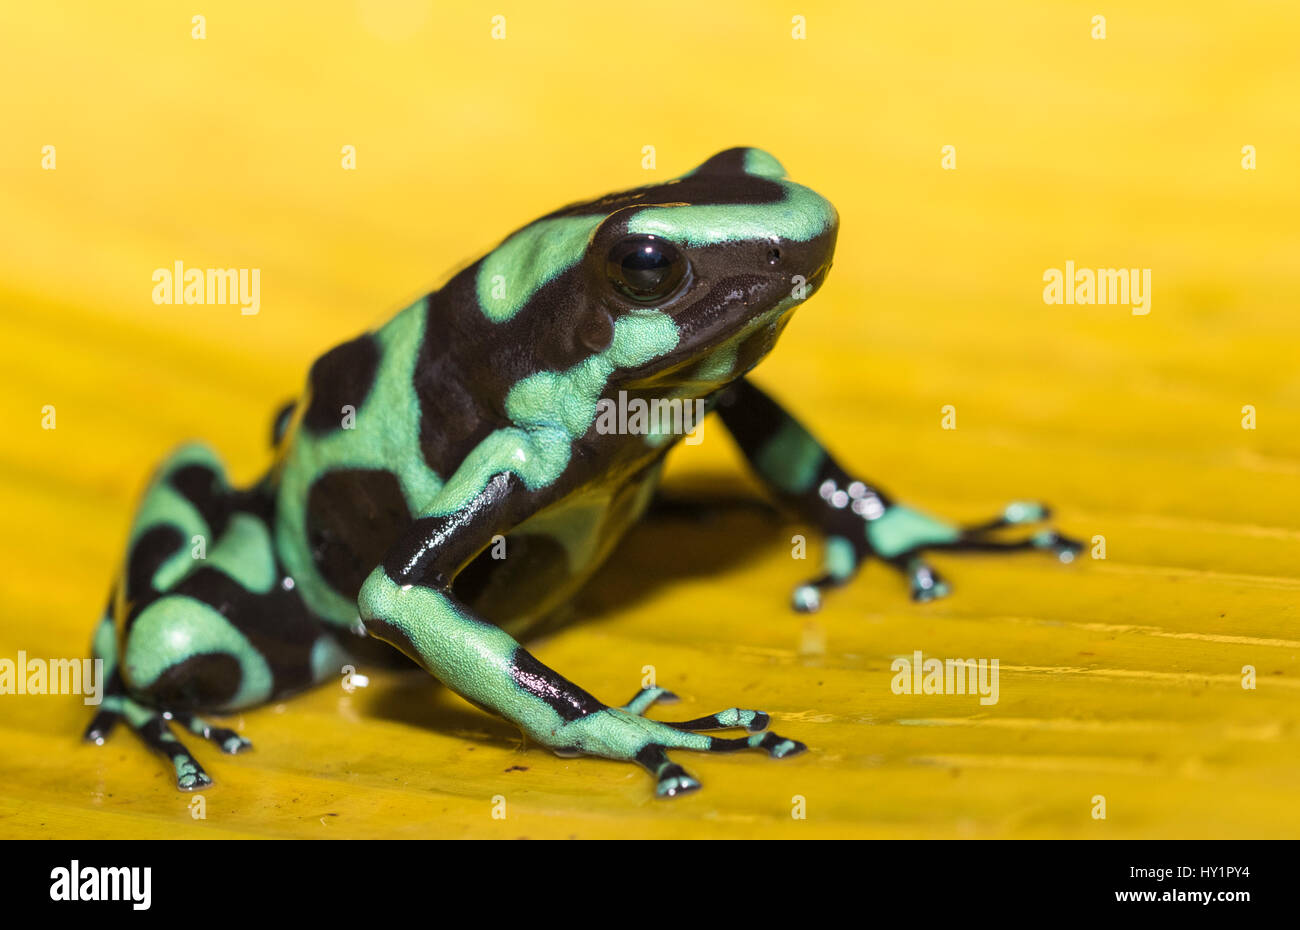 Green-and-black poison dart frog Dendrobates auratus, or green-and-black poison arrow frog sitting on a yellow banana - Stock Image